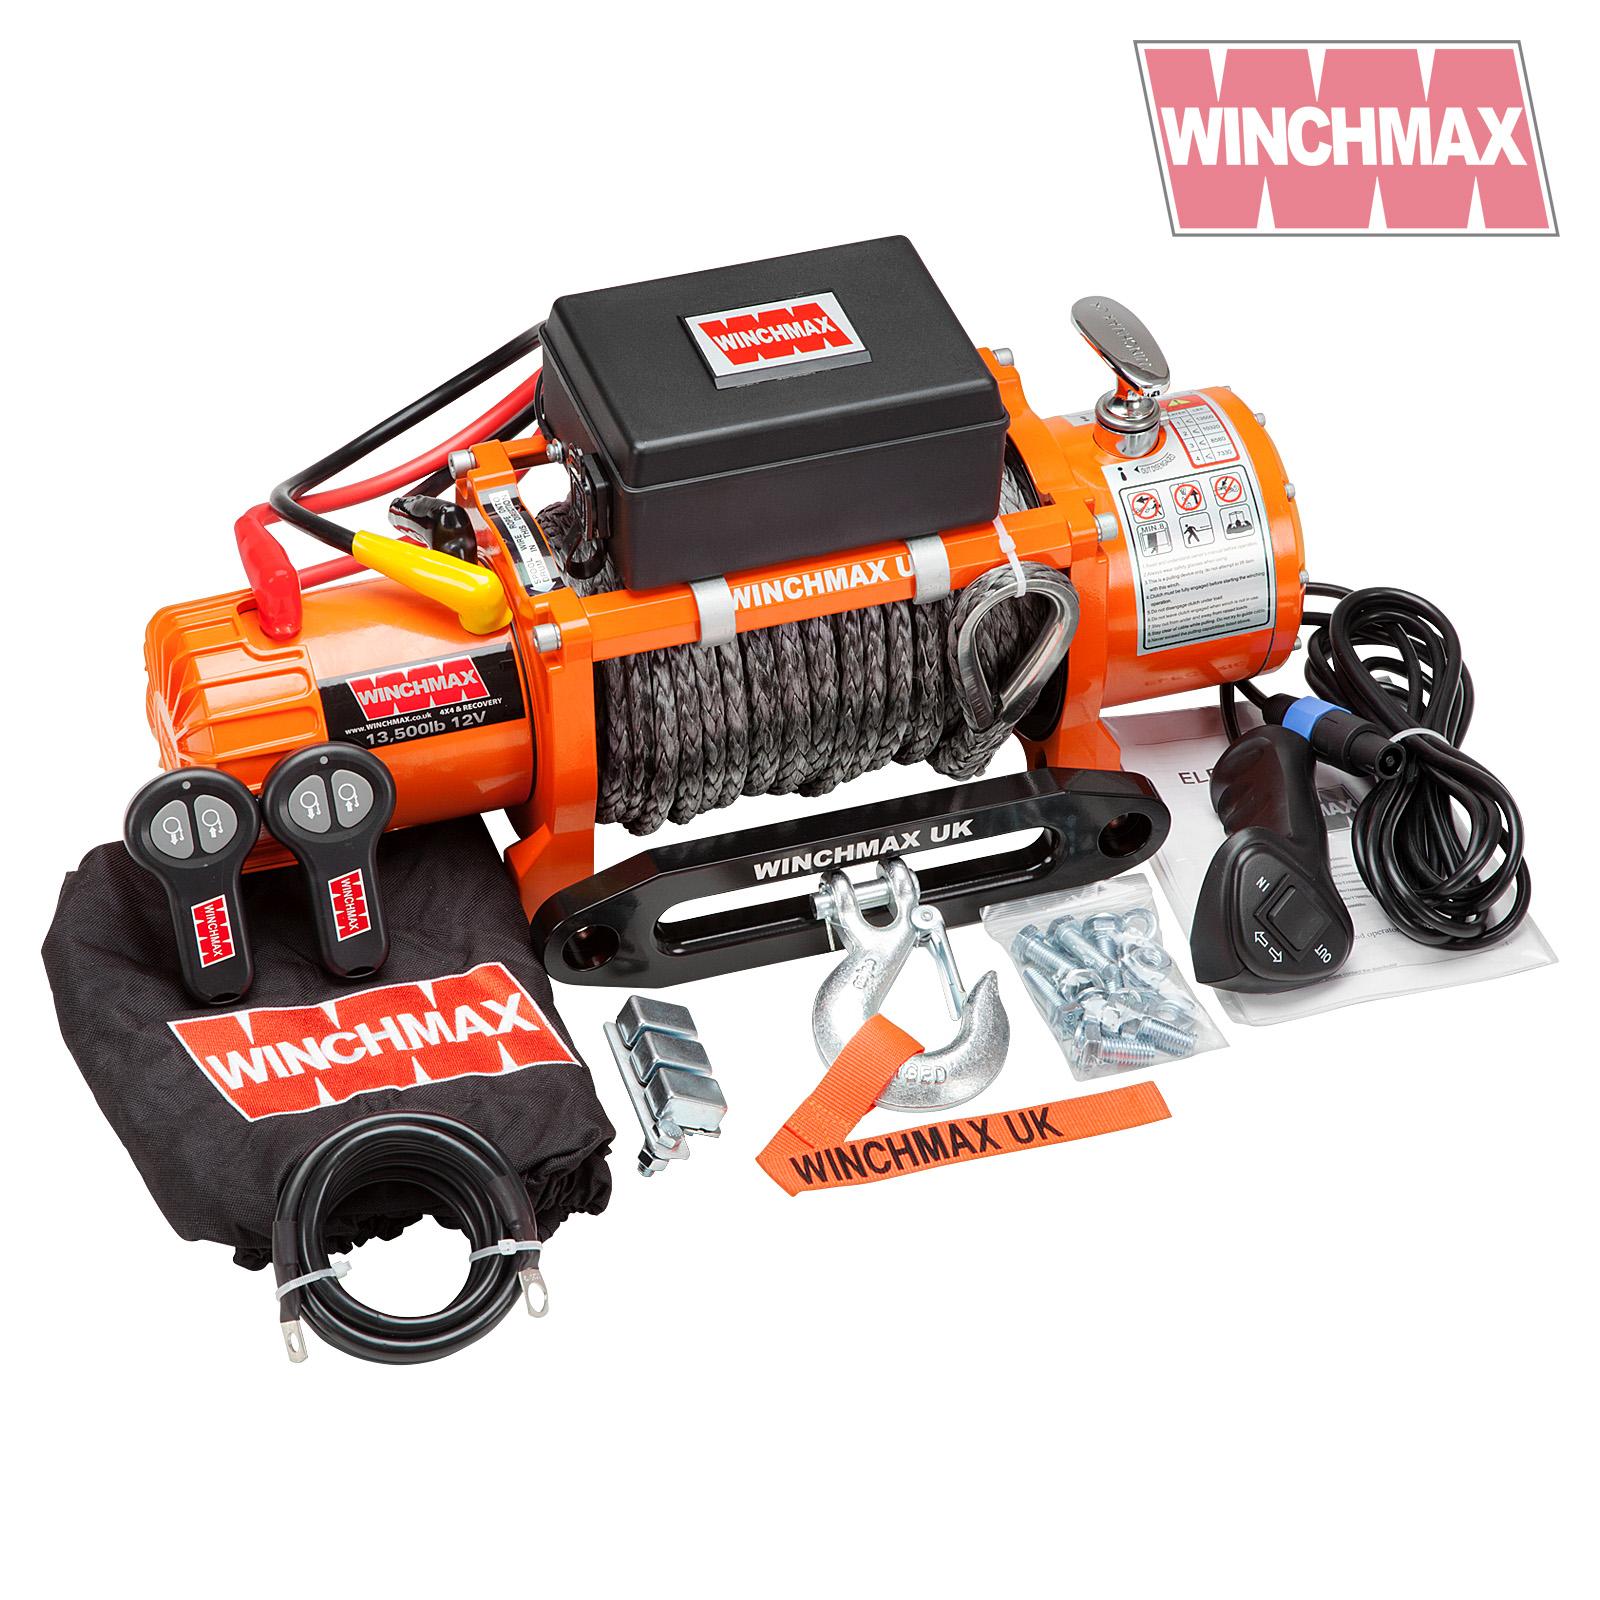 Wm1350012vsyn winchmax 495